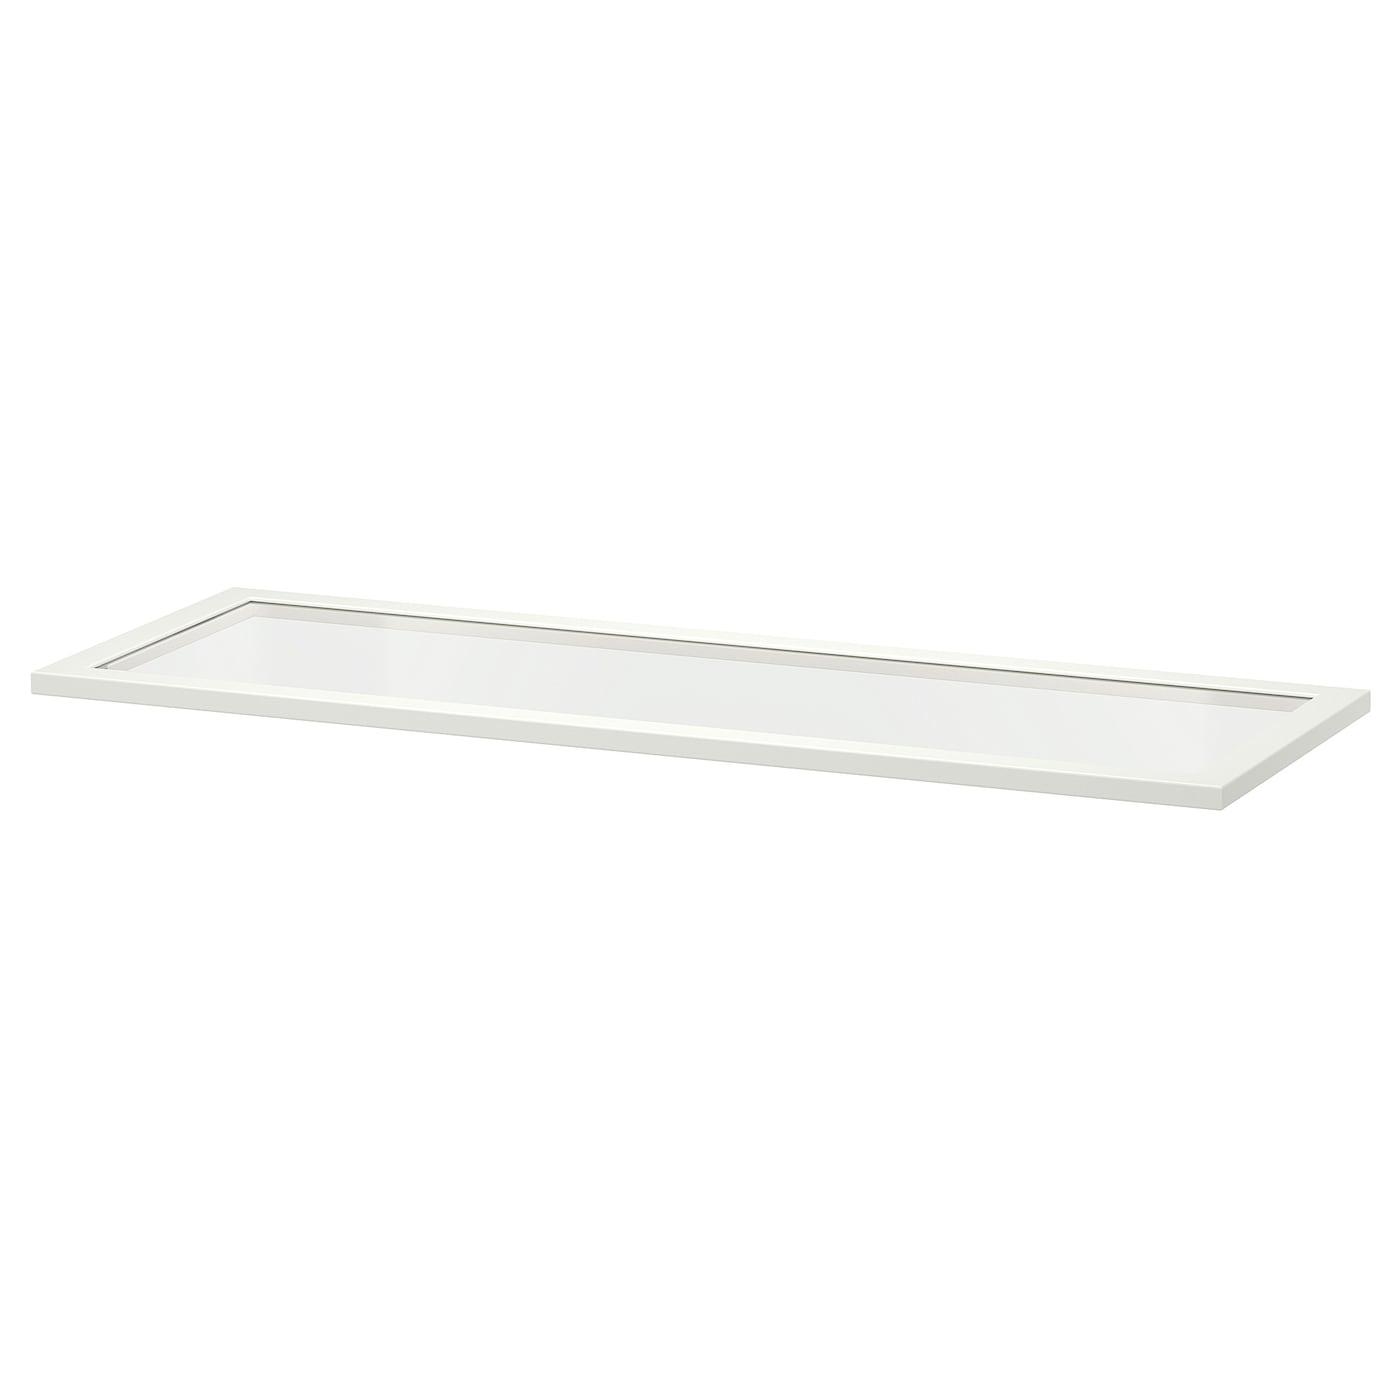 50x35cm Mobel Ikea Komplement Kleiderstange In Weiss Ausziehbar Mobel Wohnaccessoires Kleiderschranke